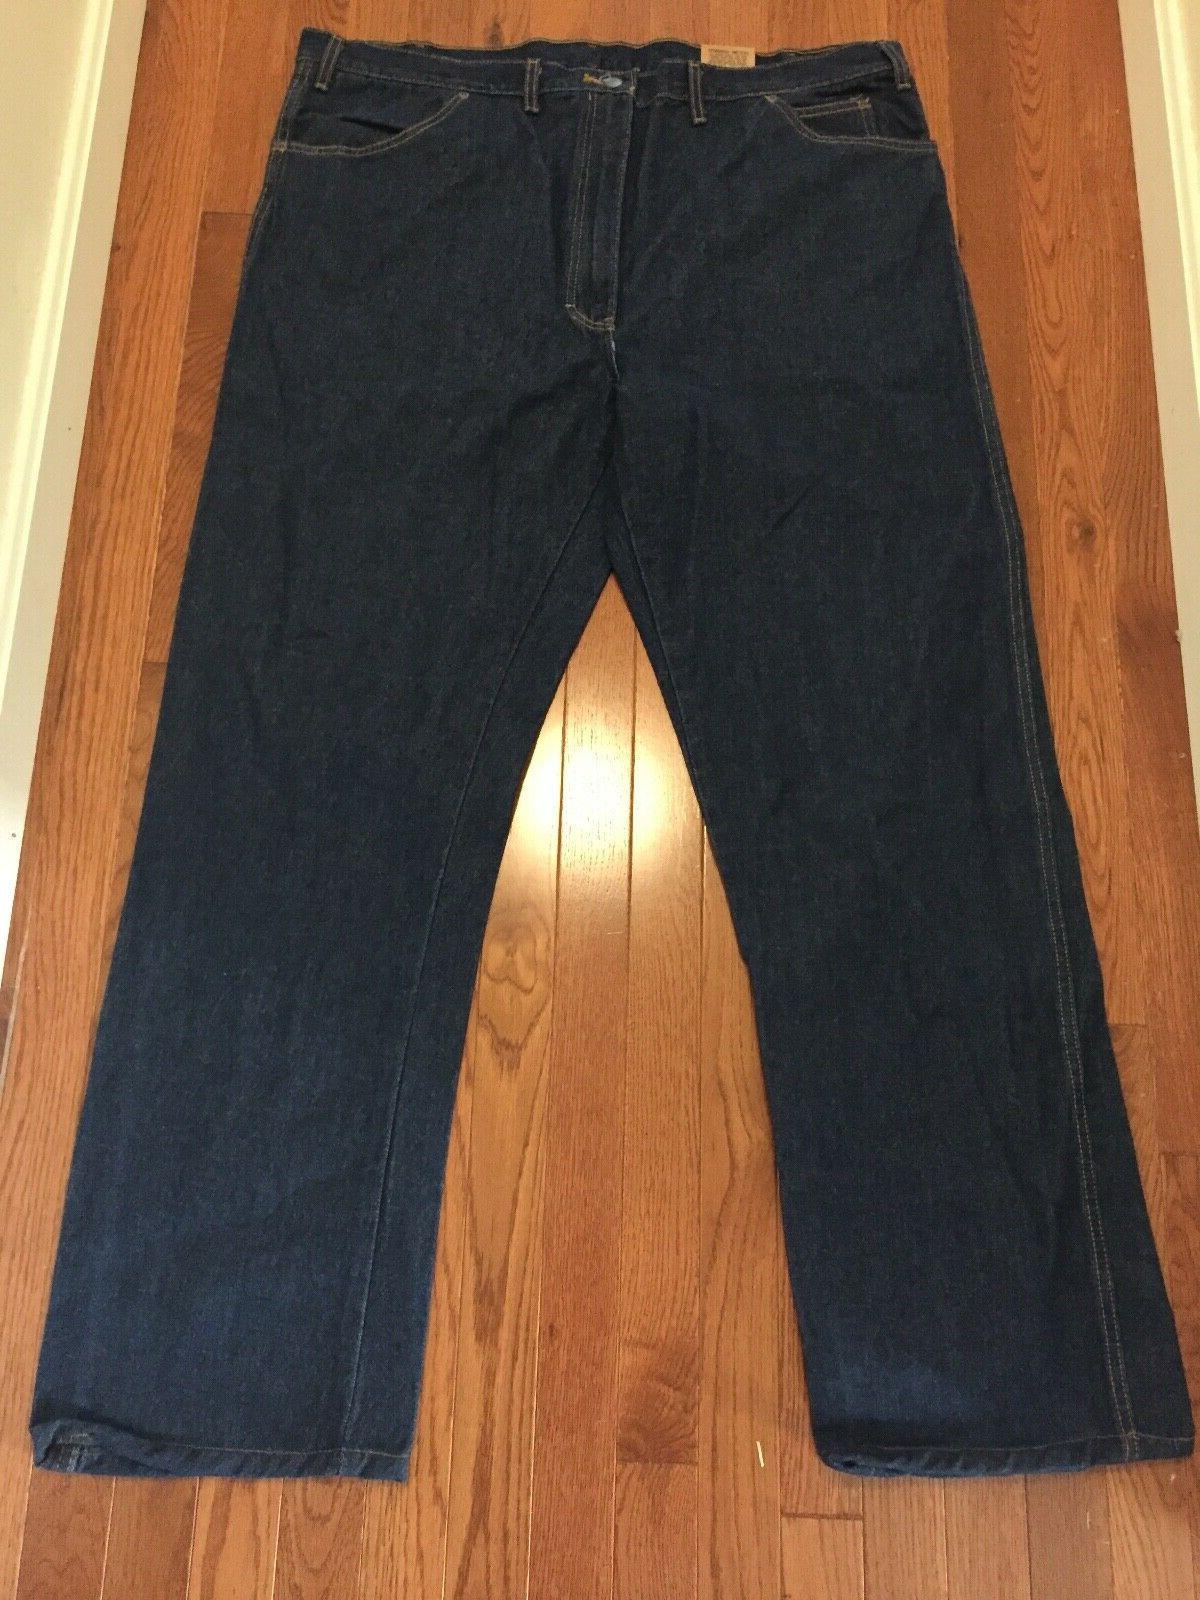 men s c993rnb regular fit denim jeans